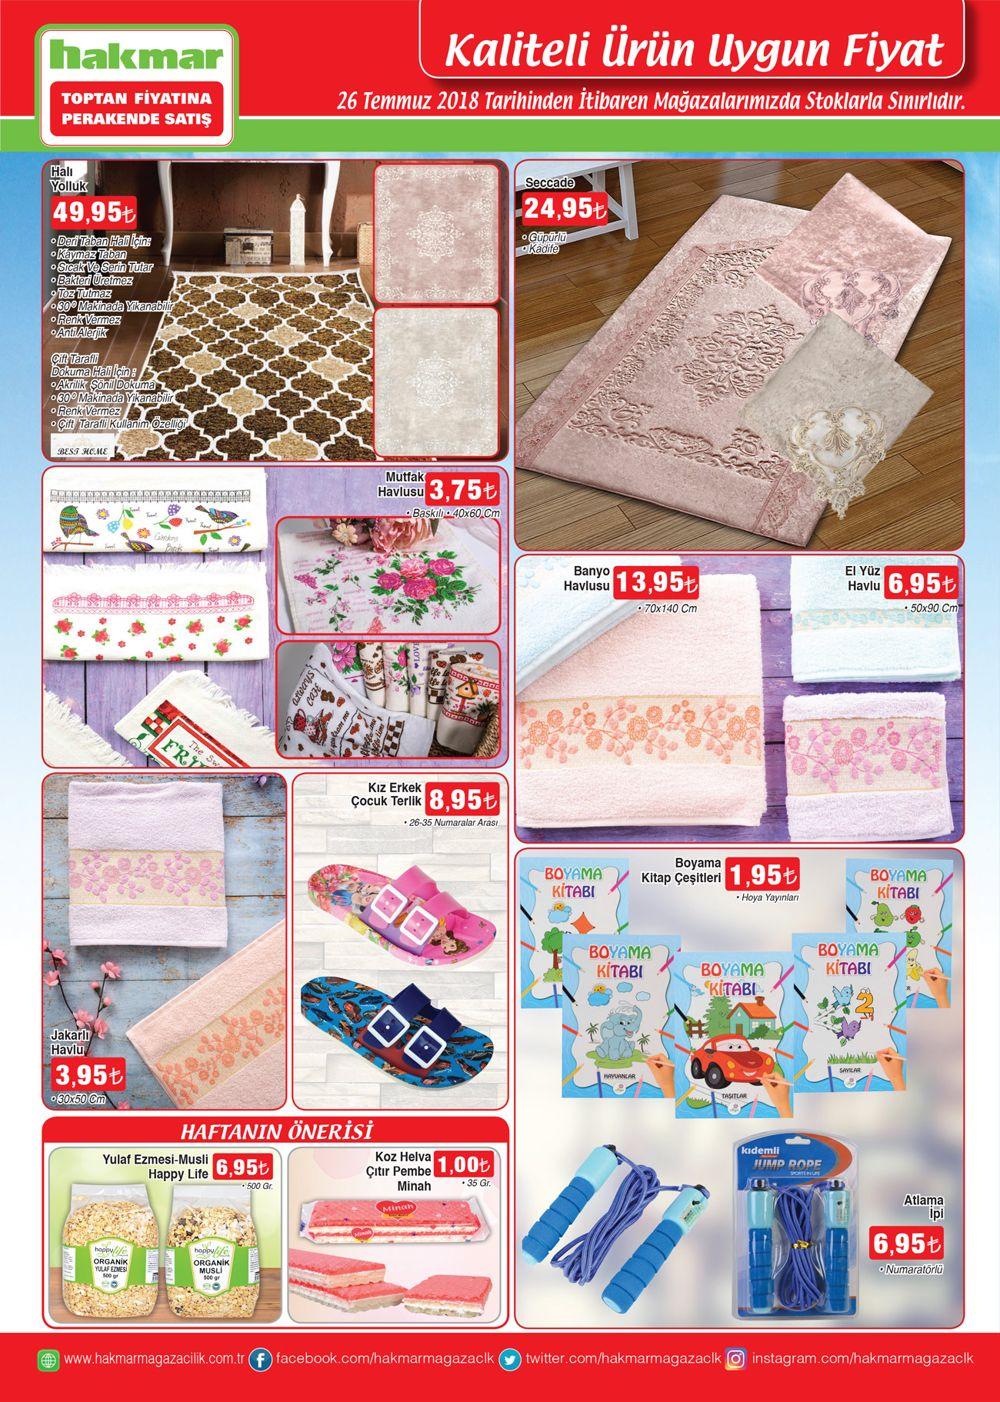 hakmar 26 temmuz 2018 aktuel katalogu tekstil urunleri